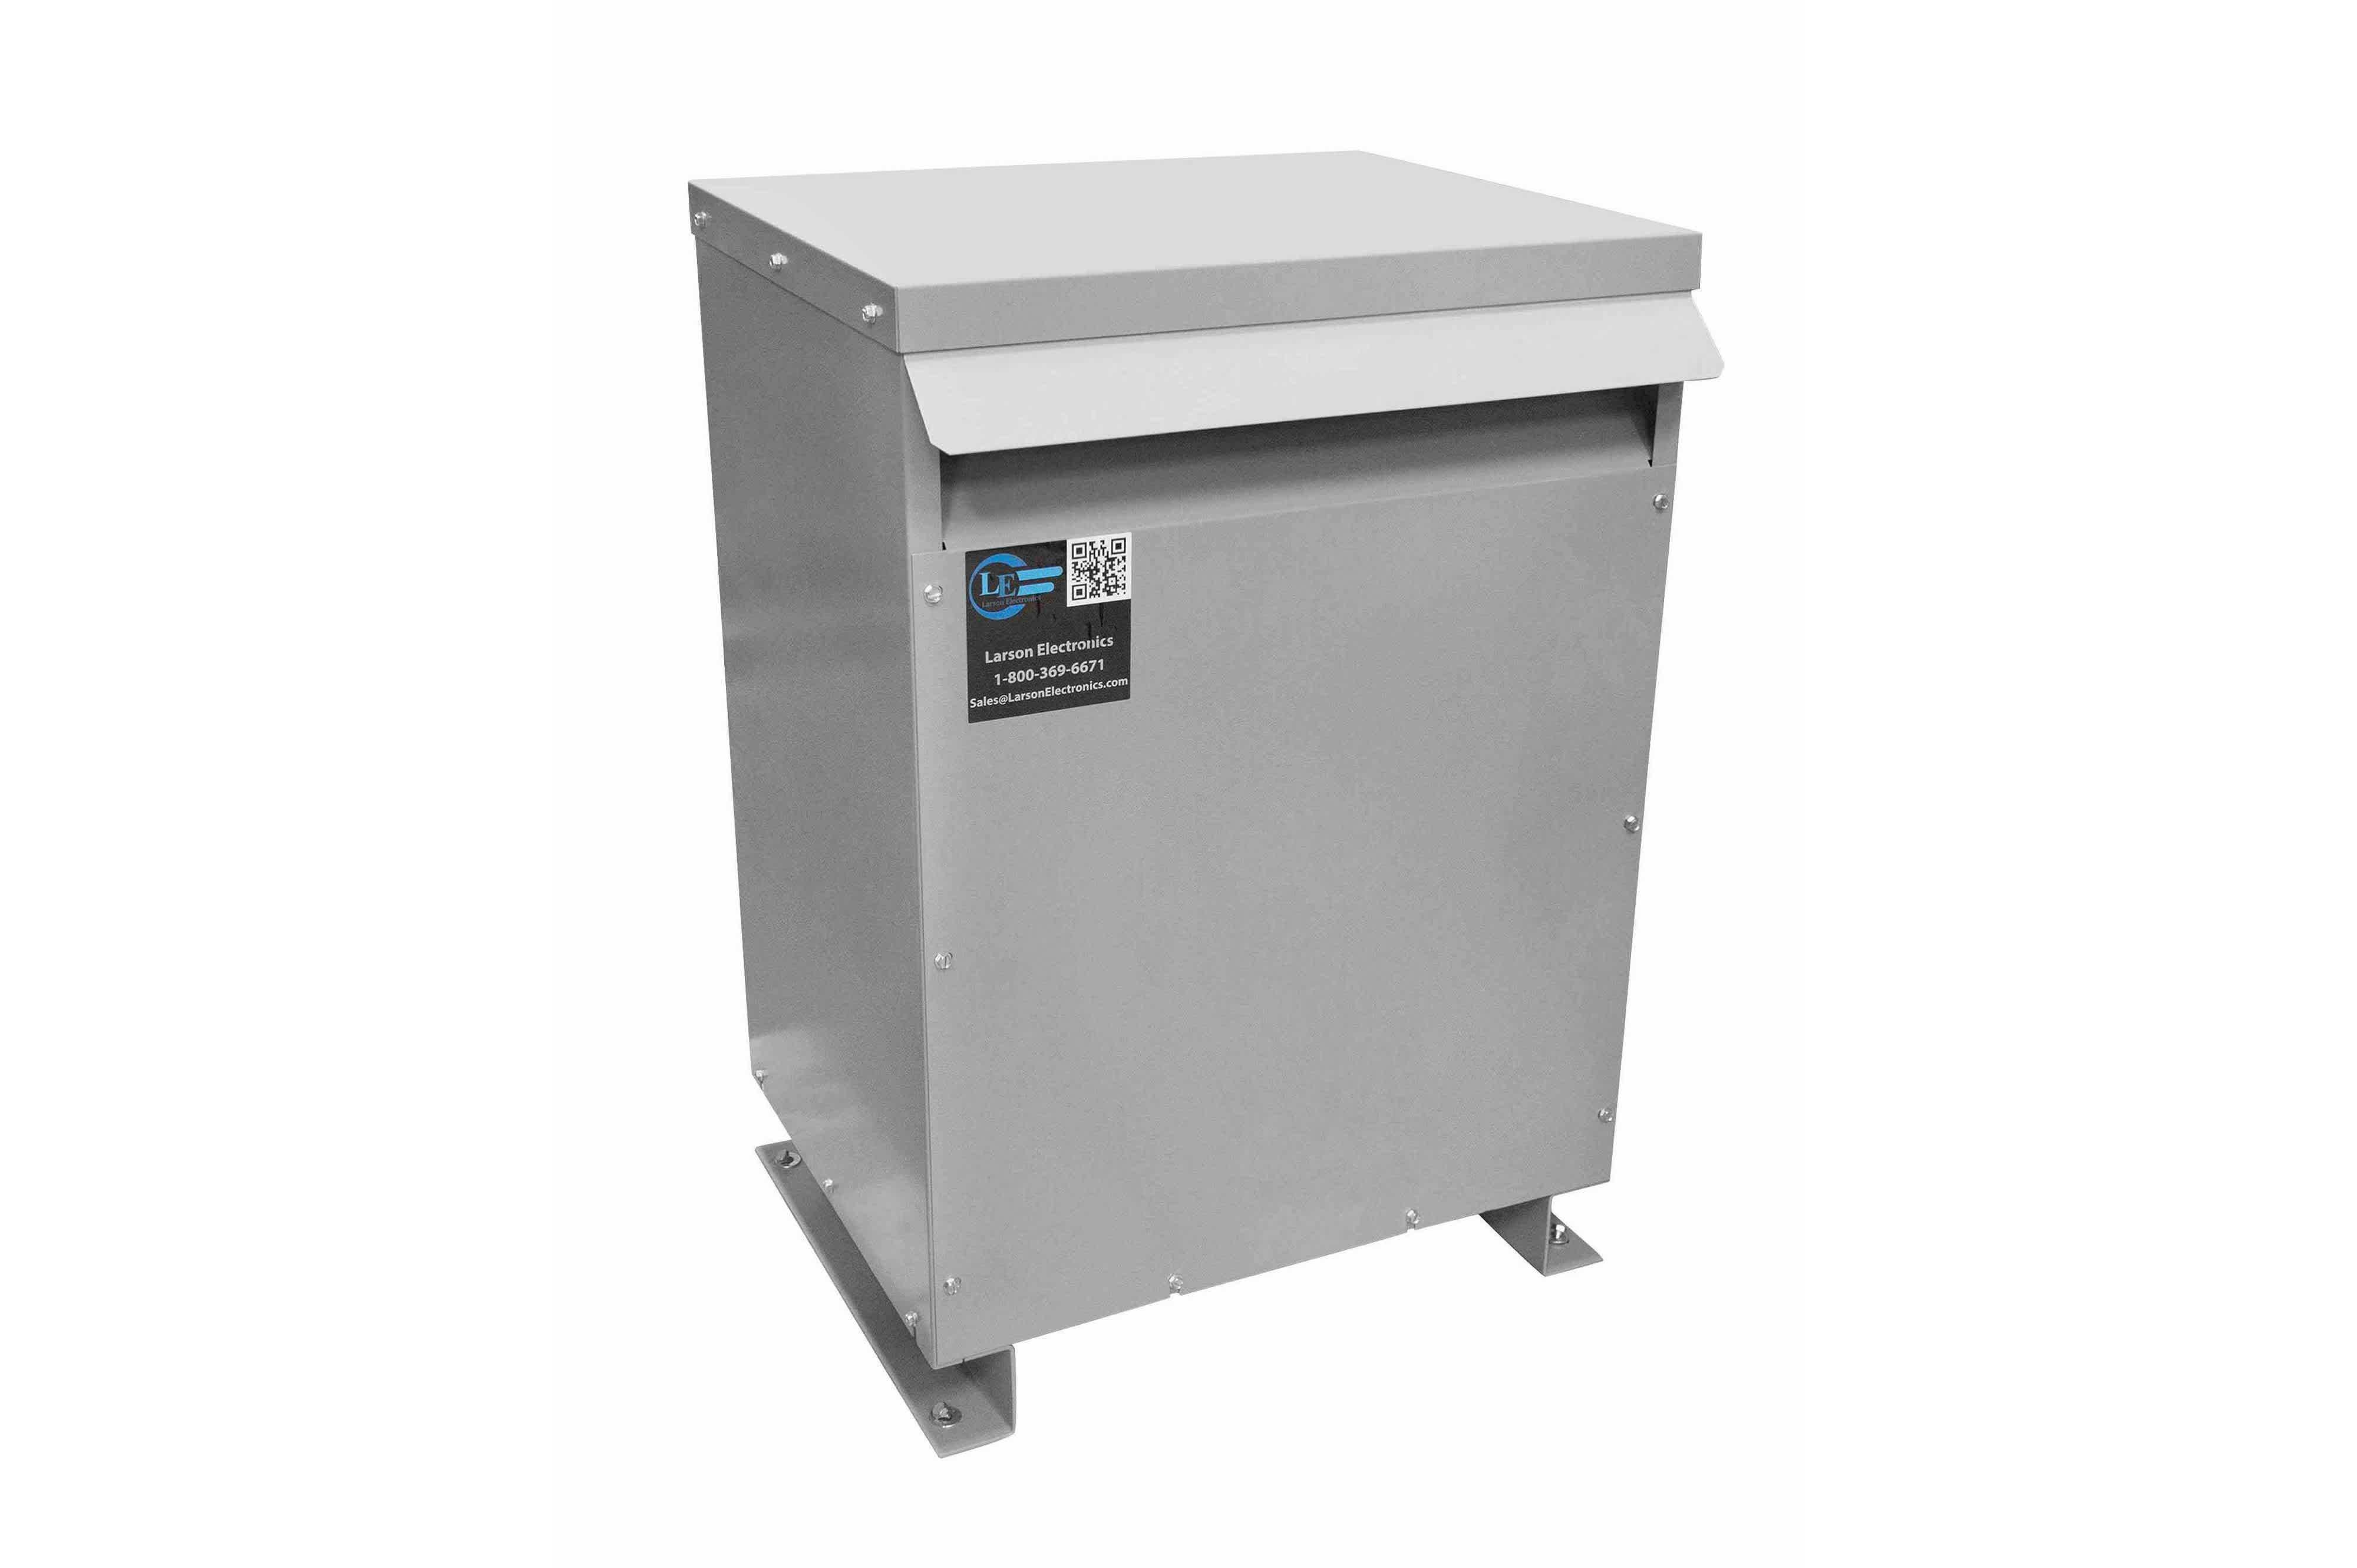 1000 kVA 3PH Isolation Transformer, 240V Wye Primary, 600Y/347 Wye-N Secondary, N3R, Ventilated, 60 Hz